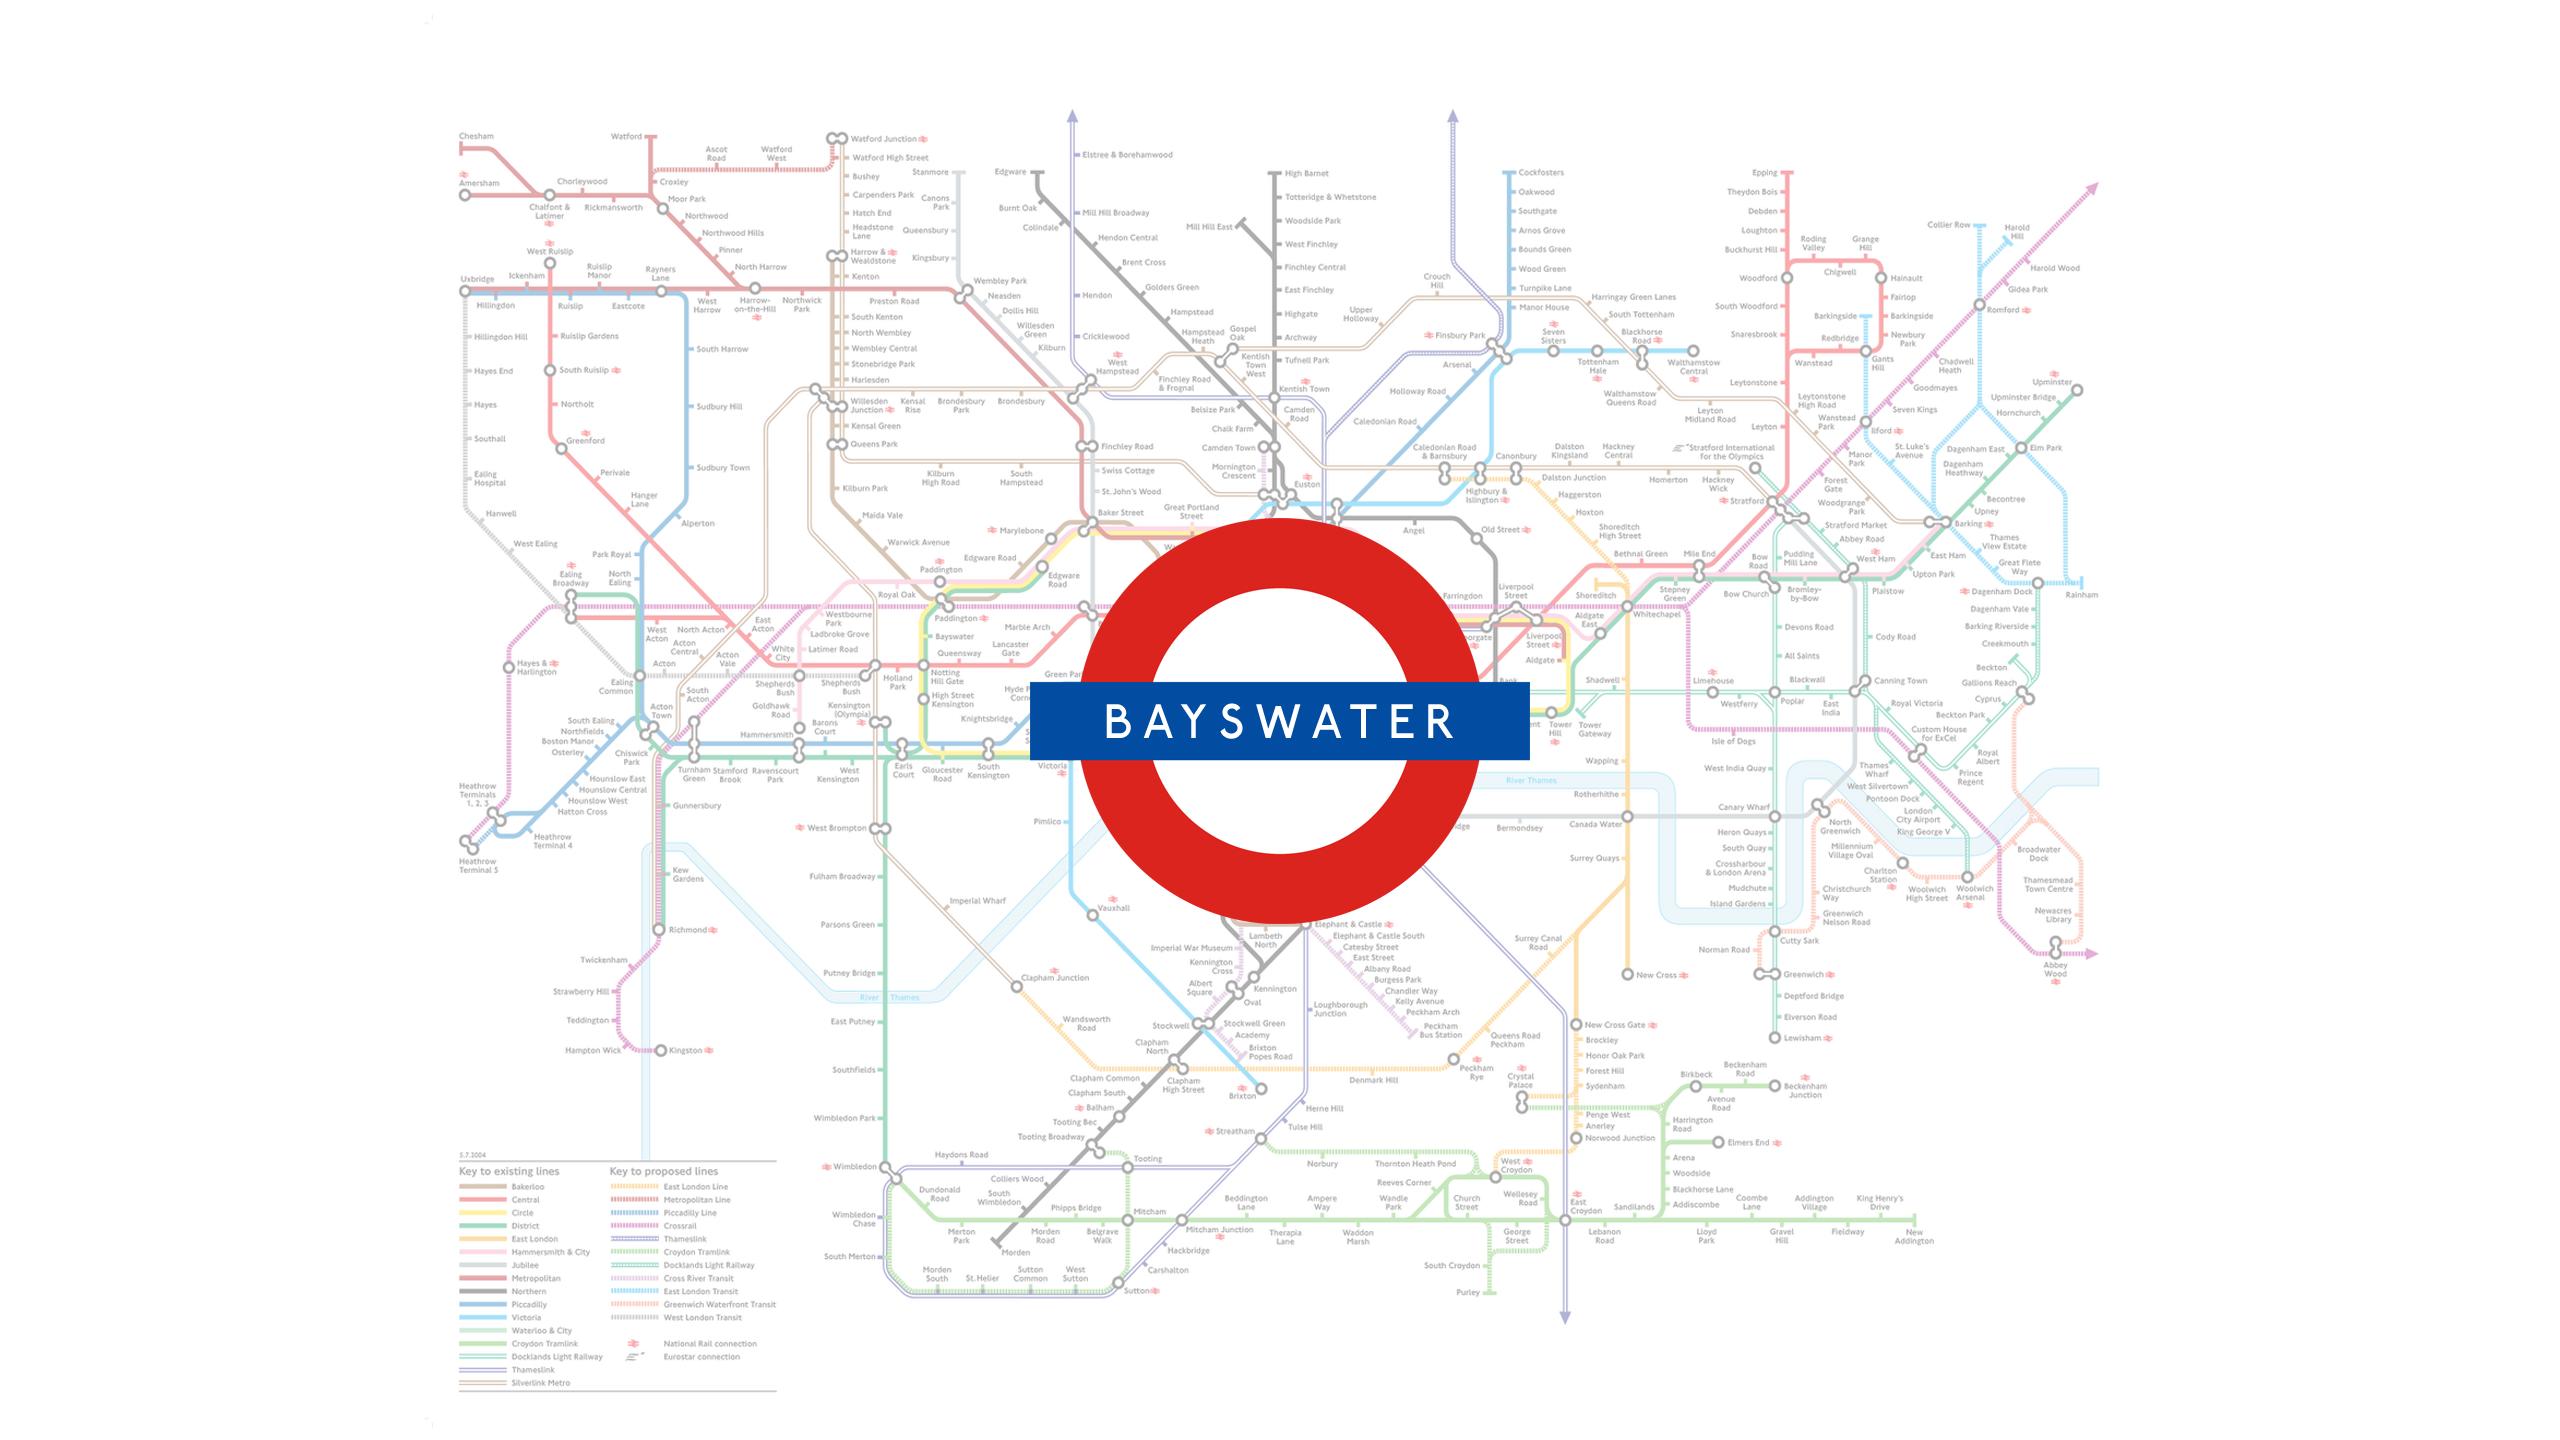 Bayswater (Map)